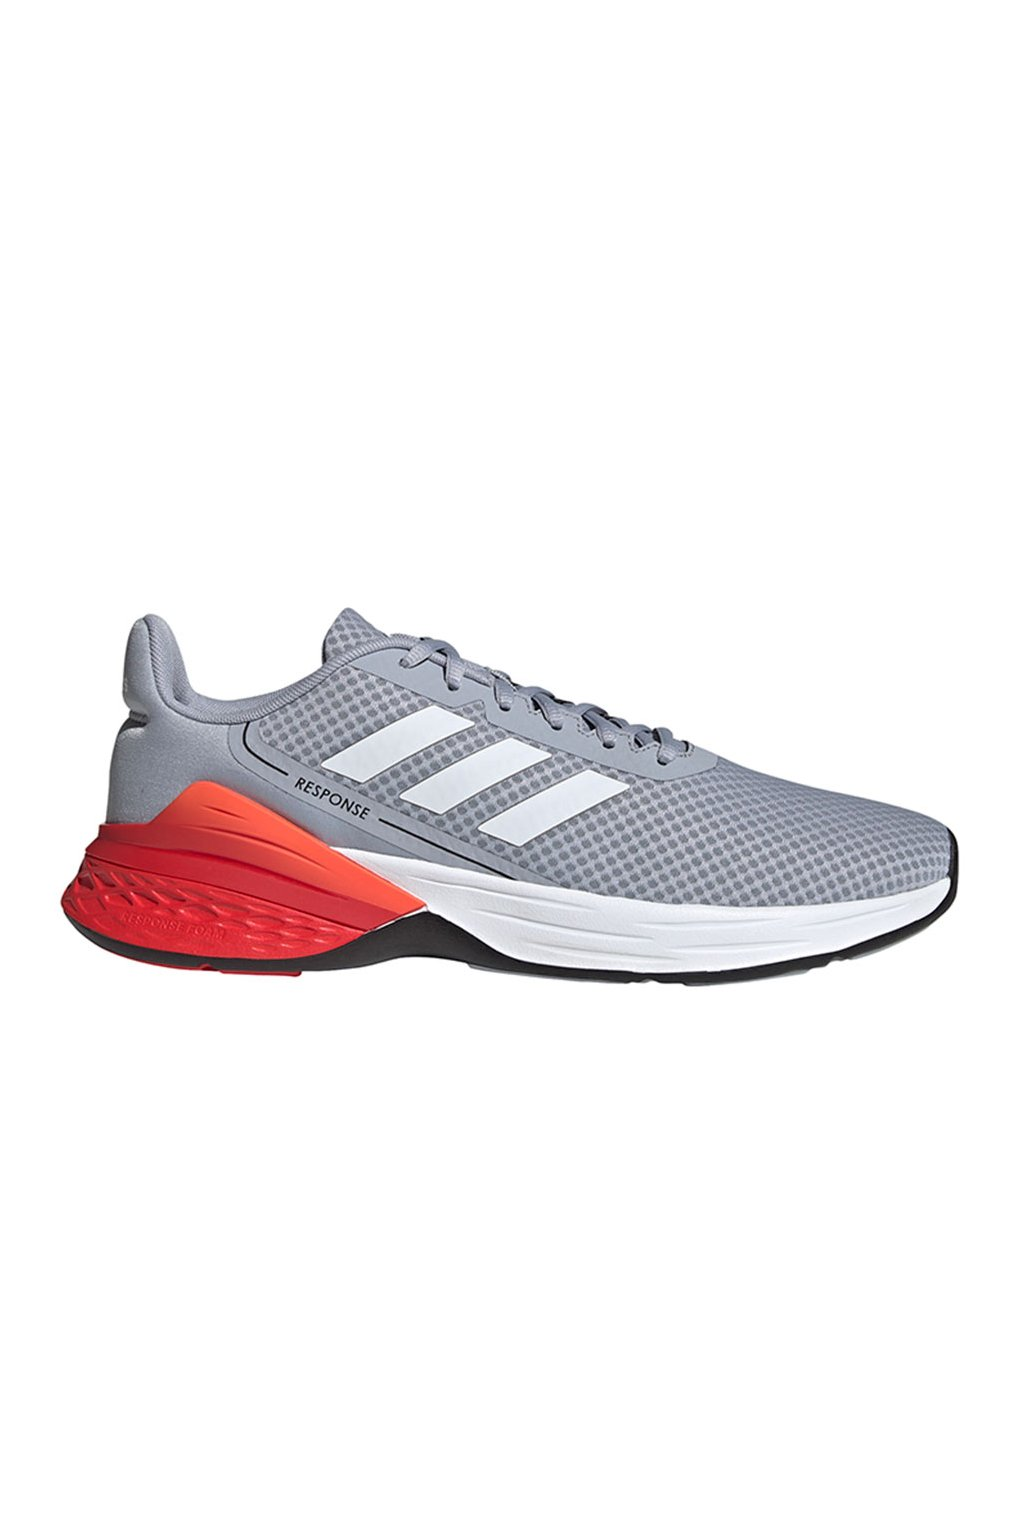 Pánske topánky Adidas Response SR šedo červené FY9152